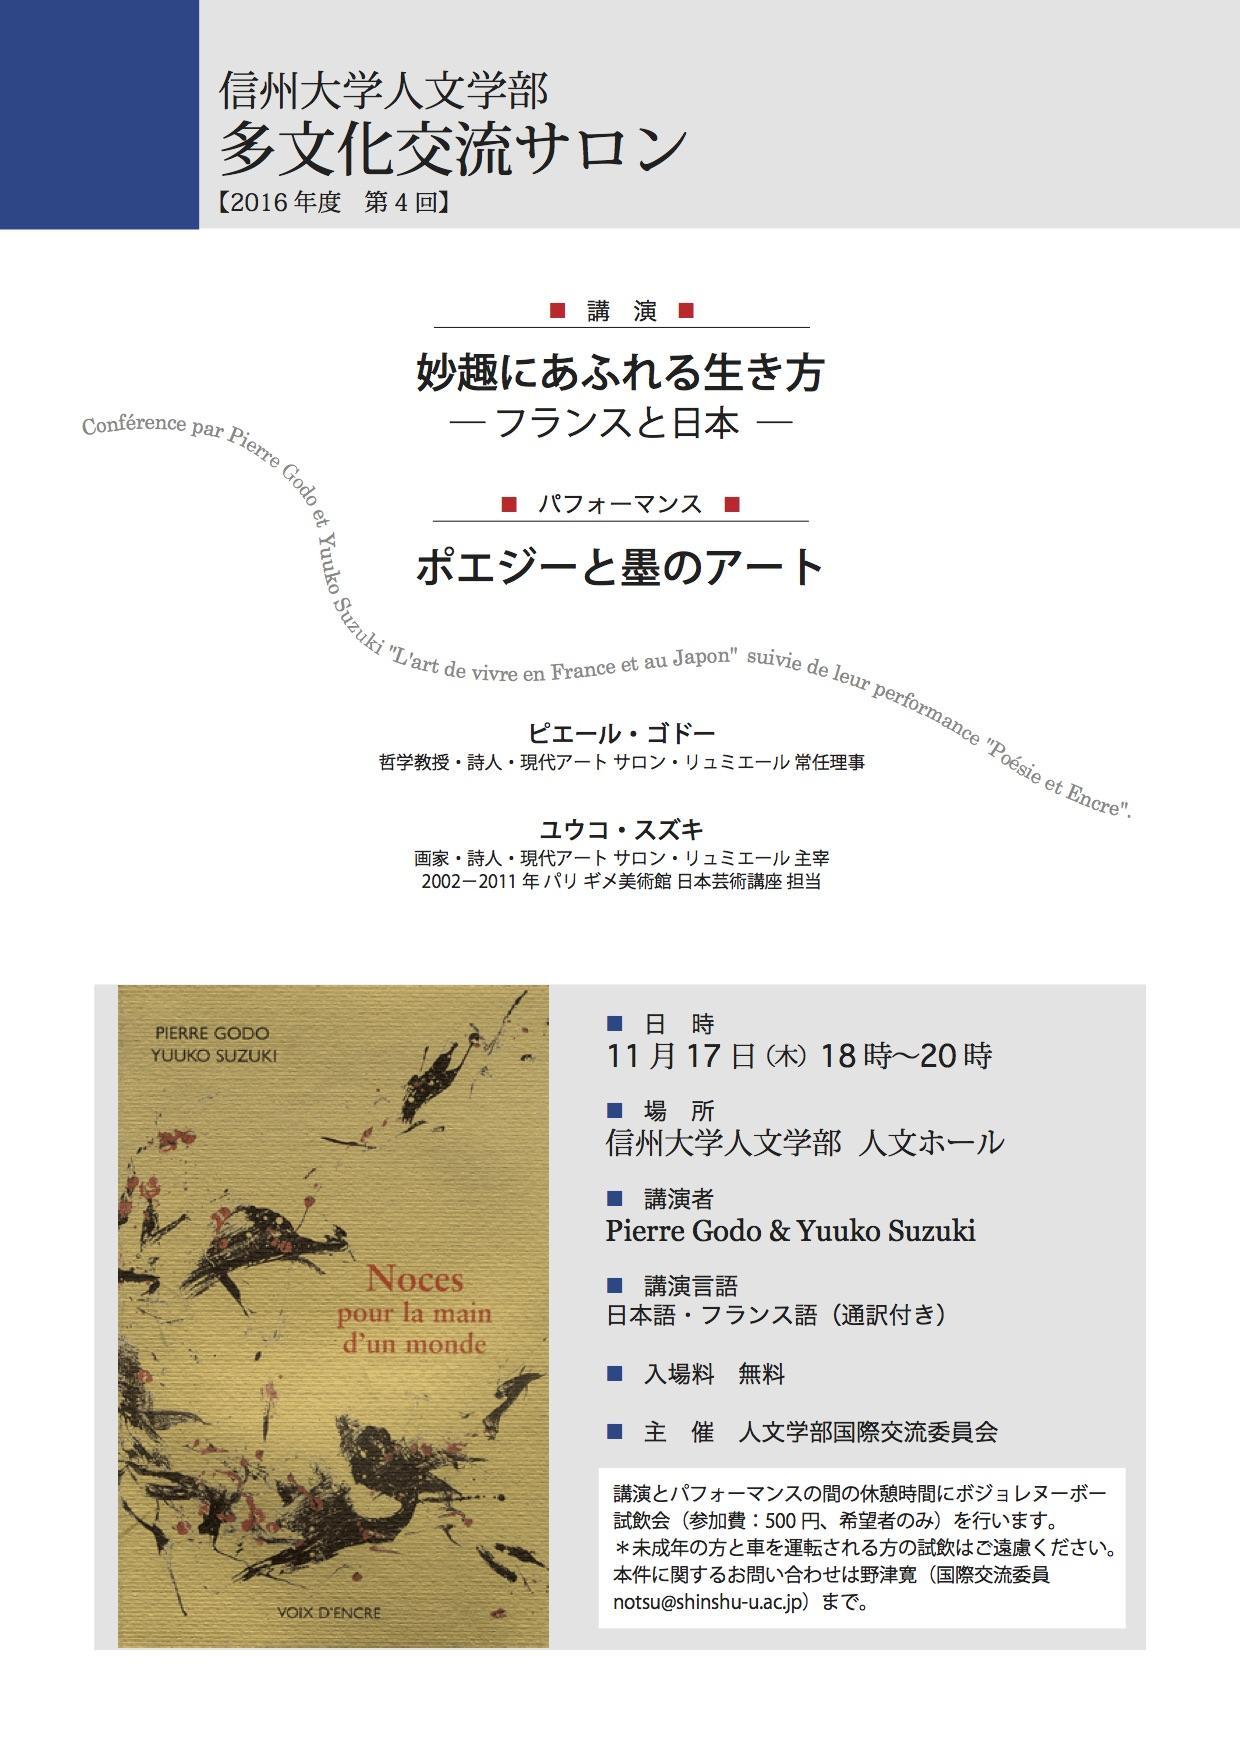 http://www.shinshu-u.ac.jp/faculty/arts/news/20161117poster_4.jpg